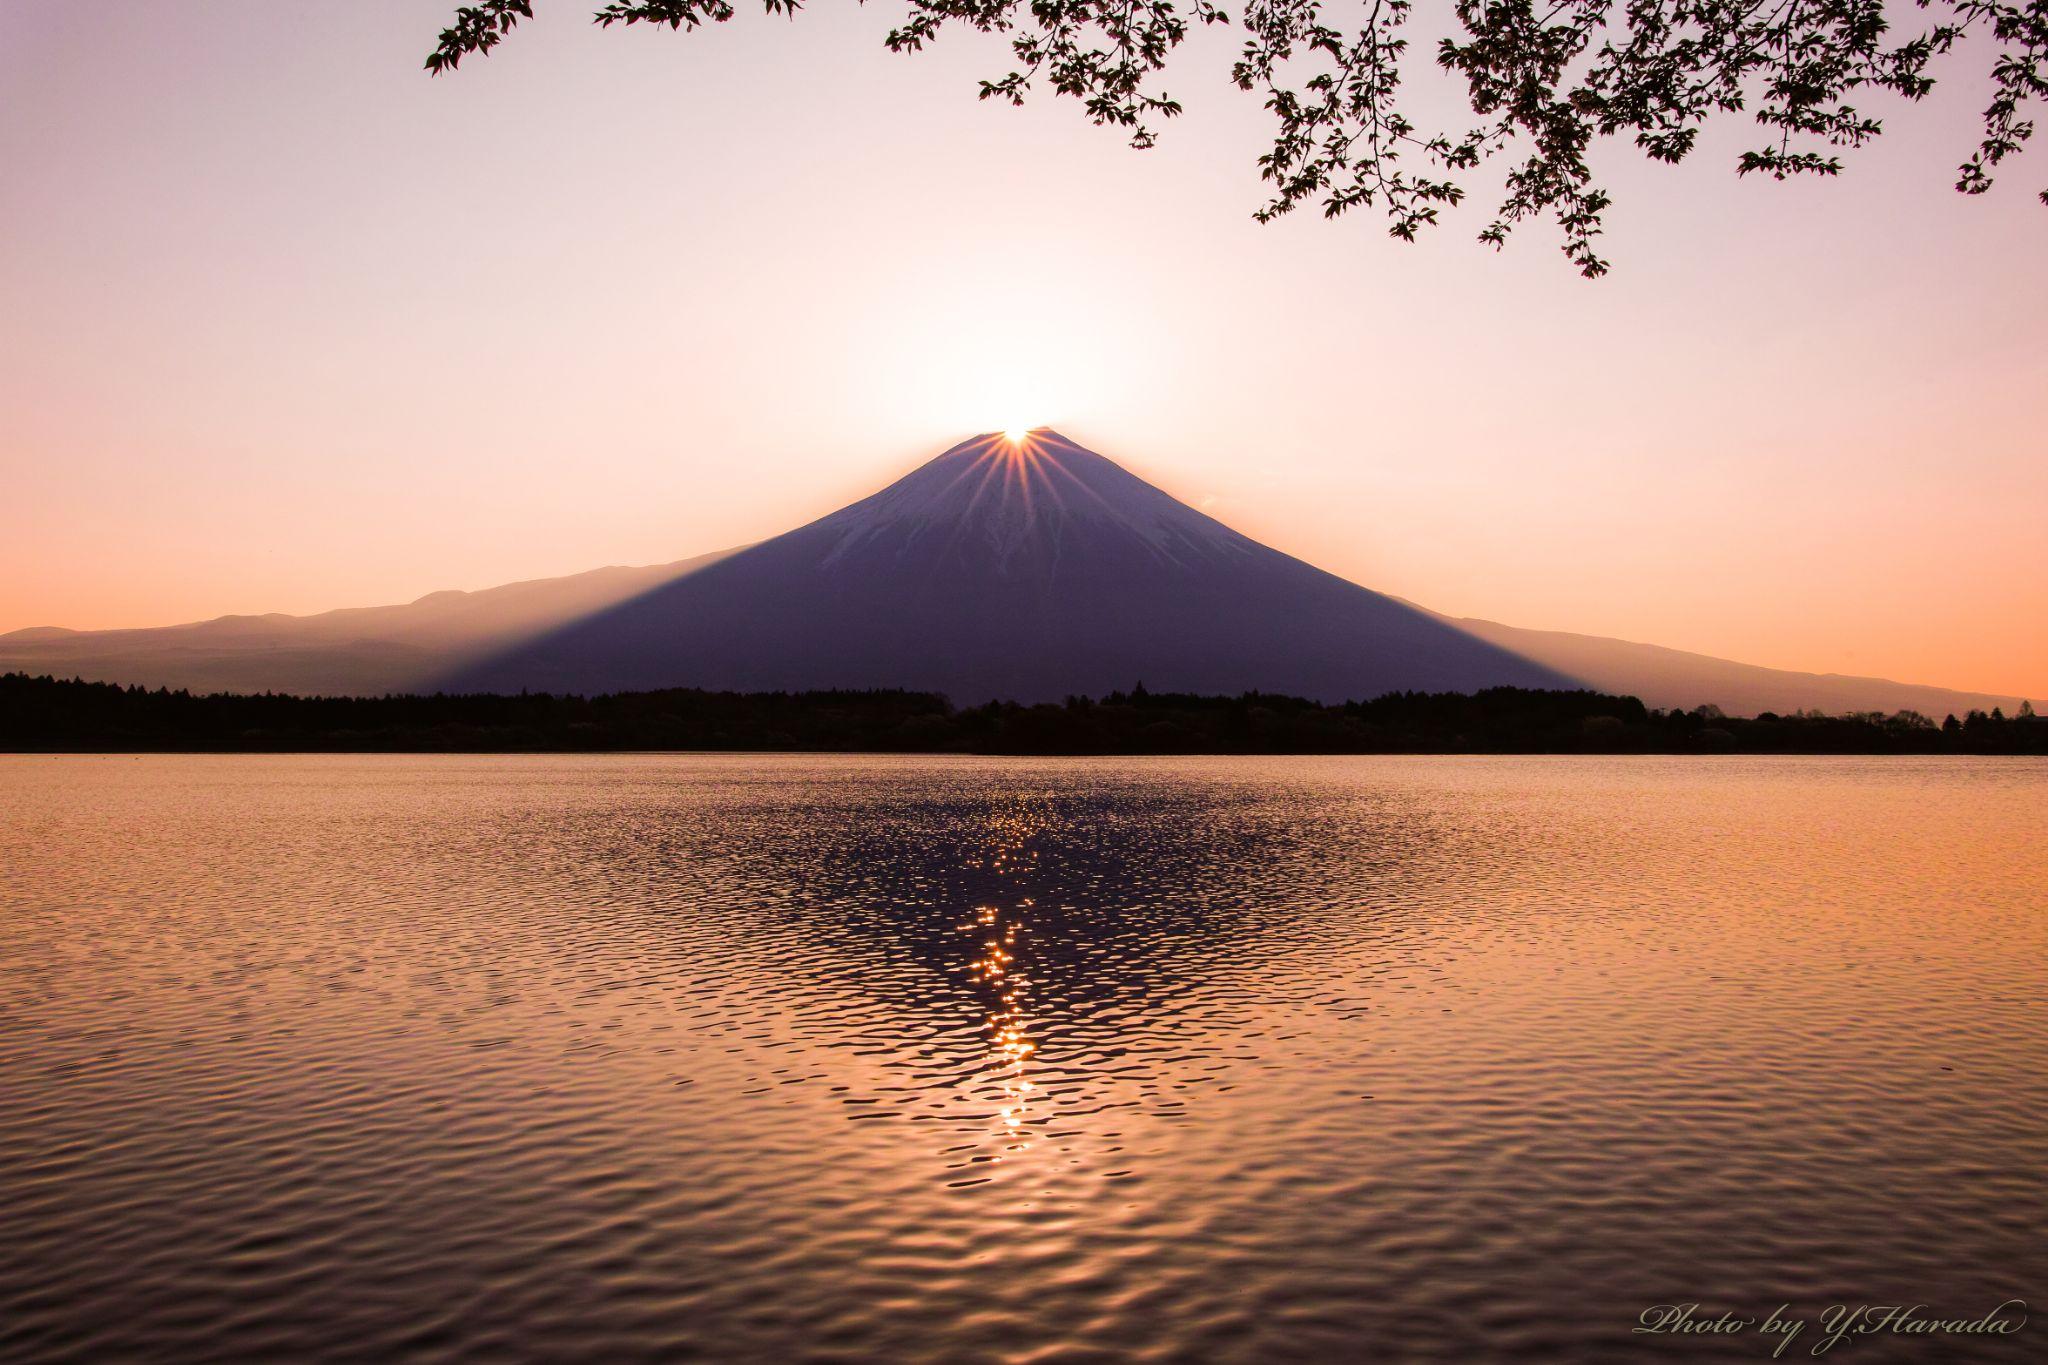 Diamond Fuji by Yuichi Harada